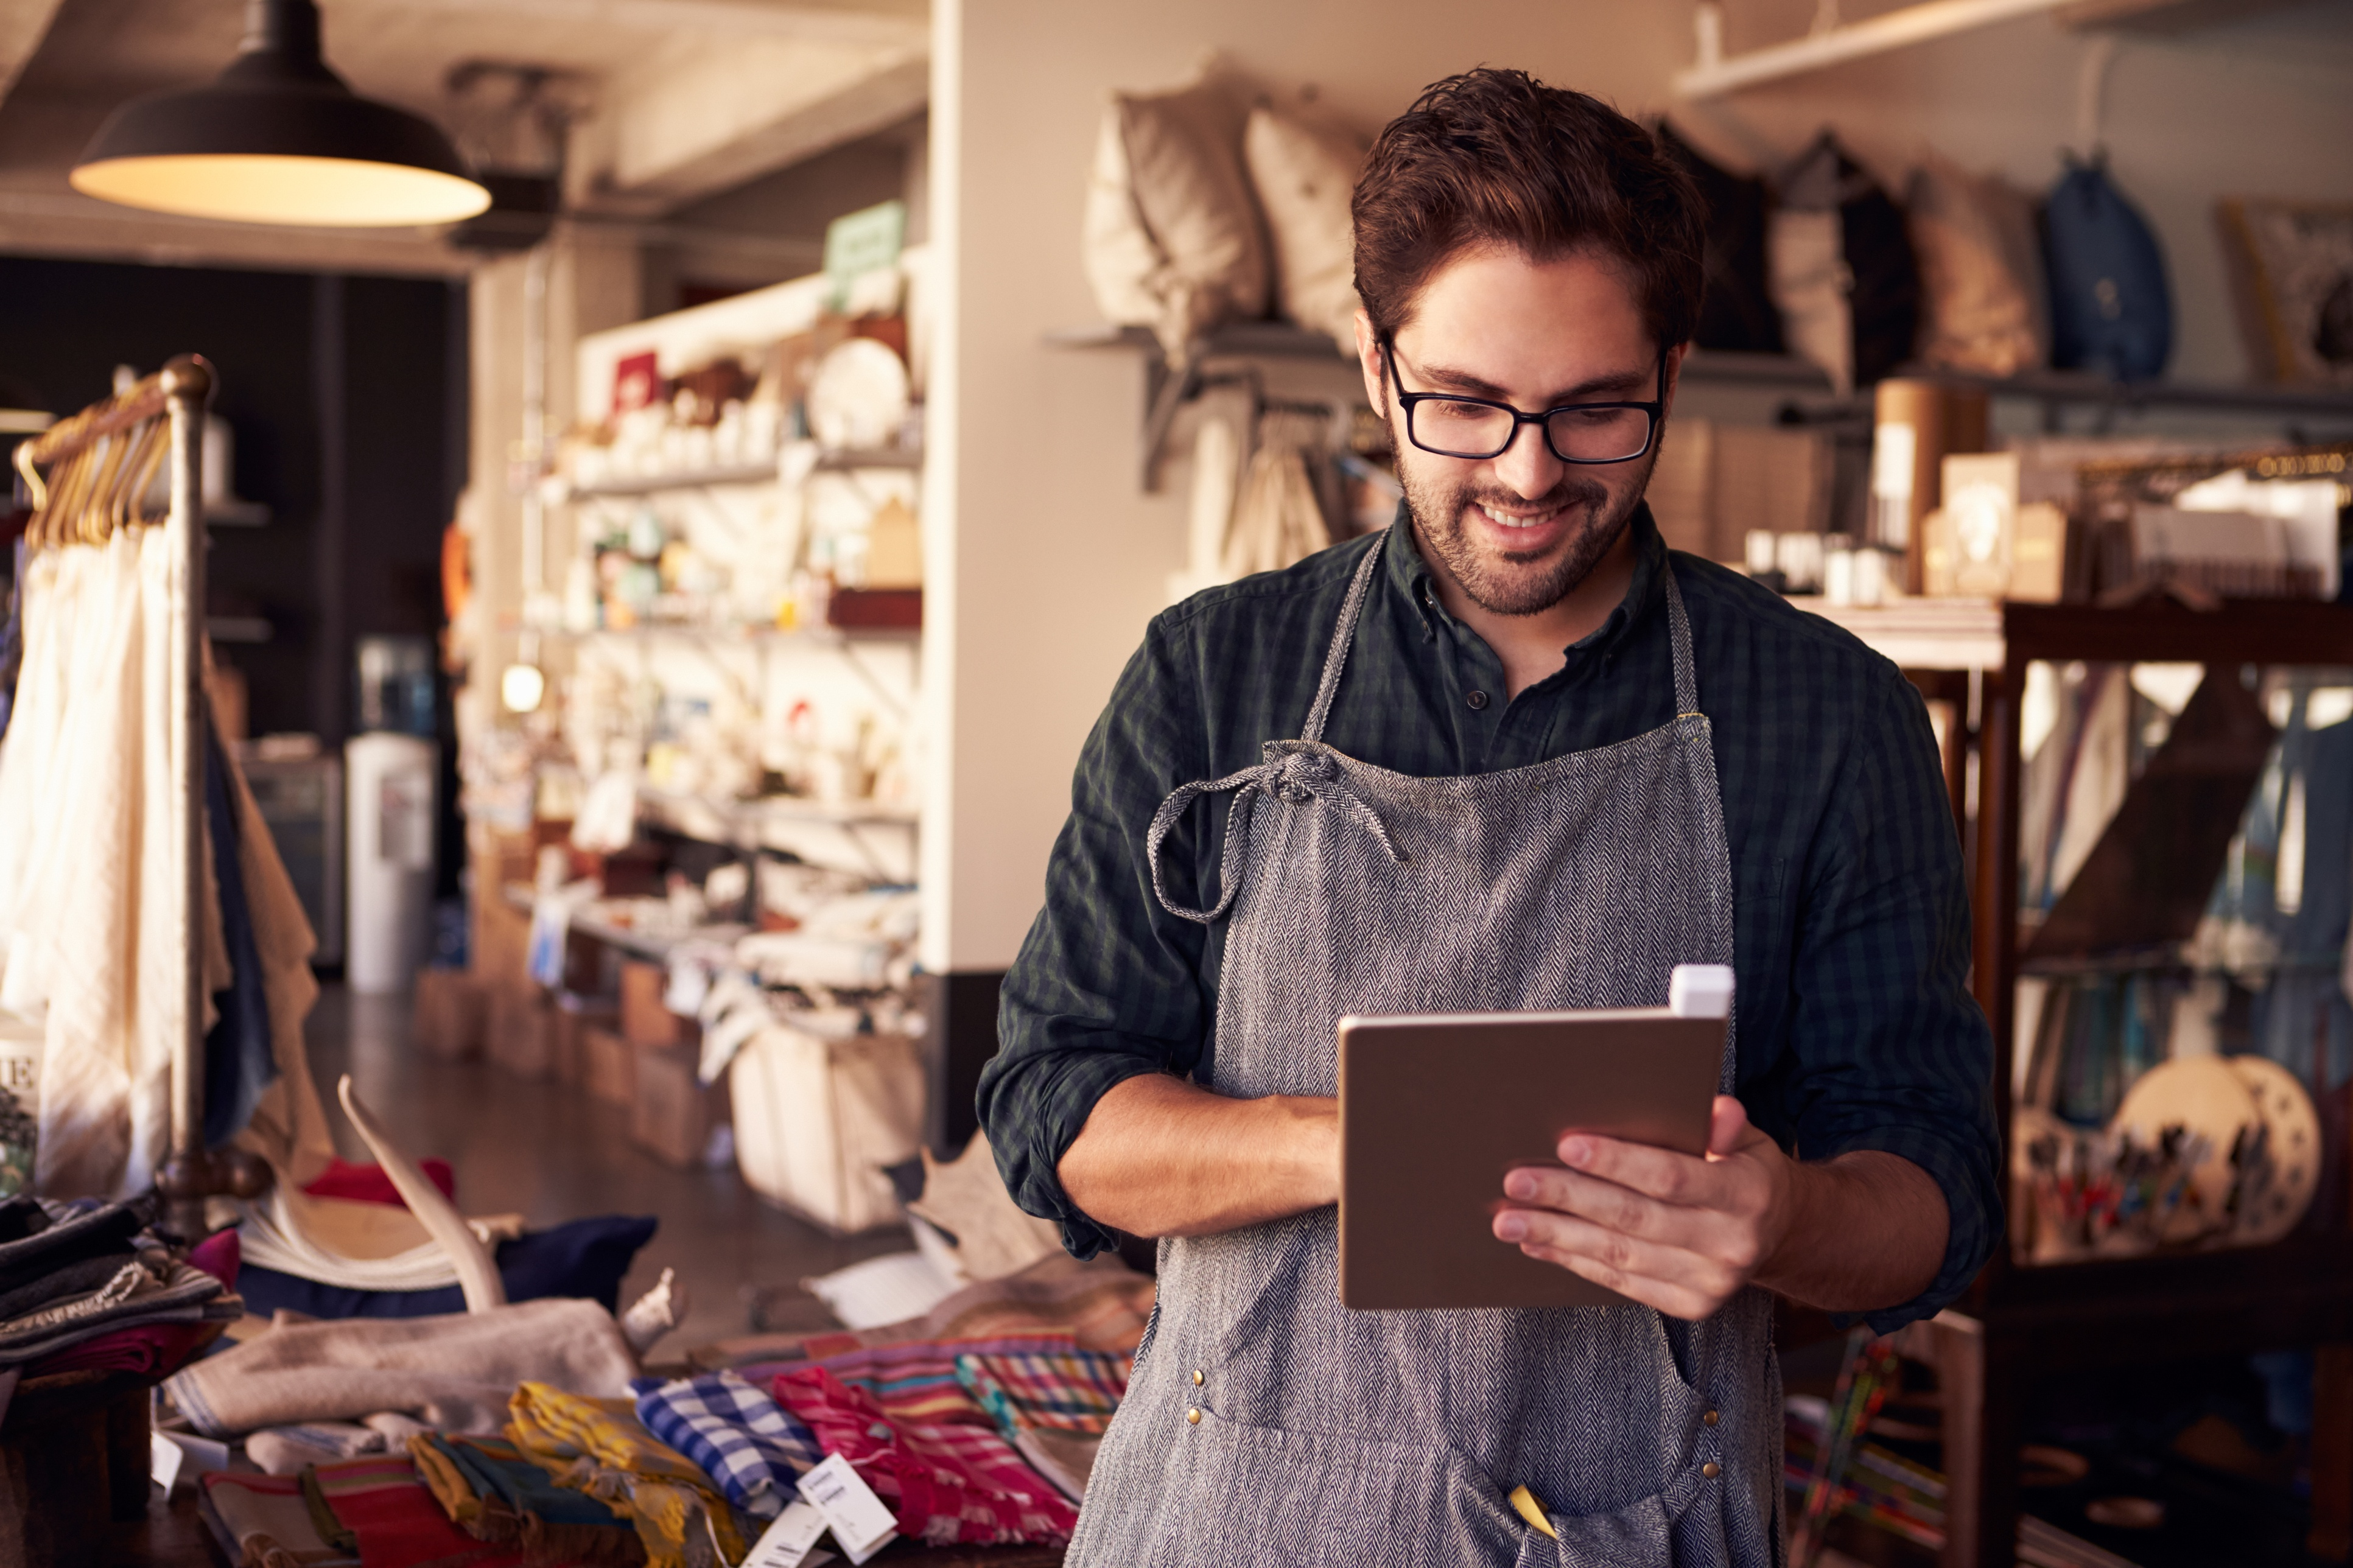 Retail and IoT, Part I: Optimizing Transportation